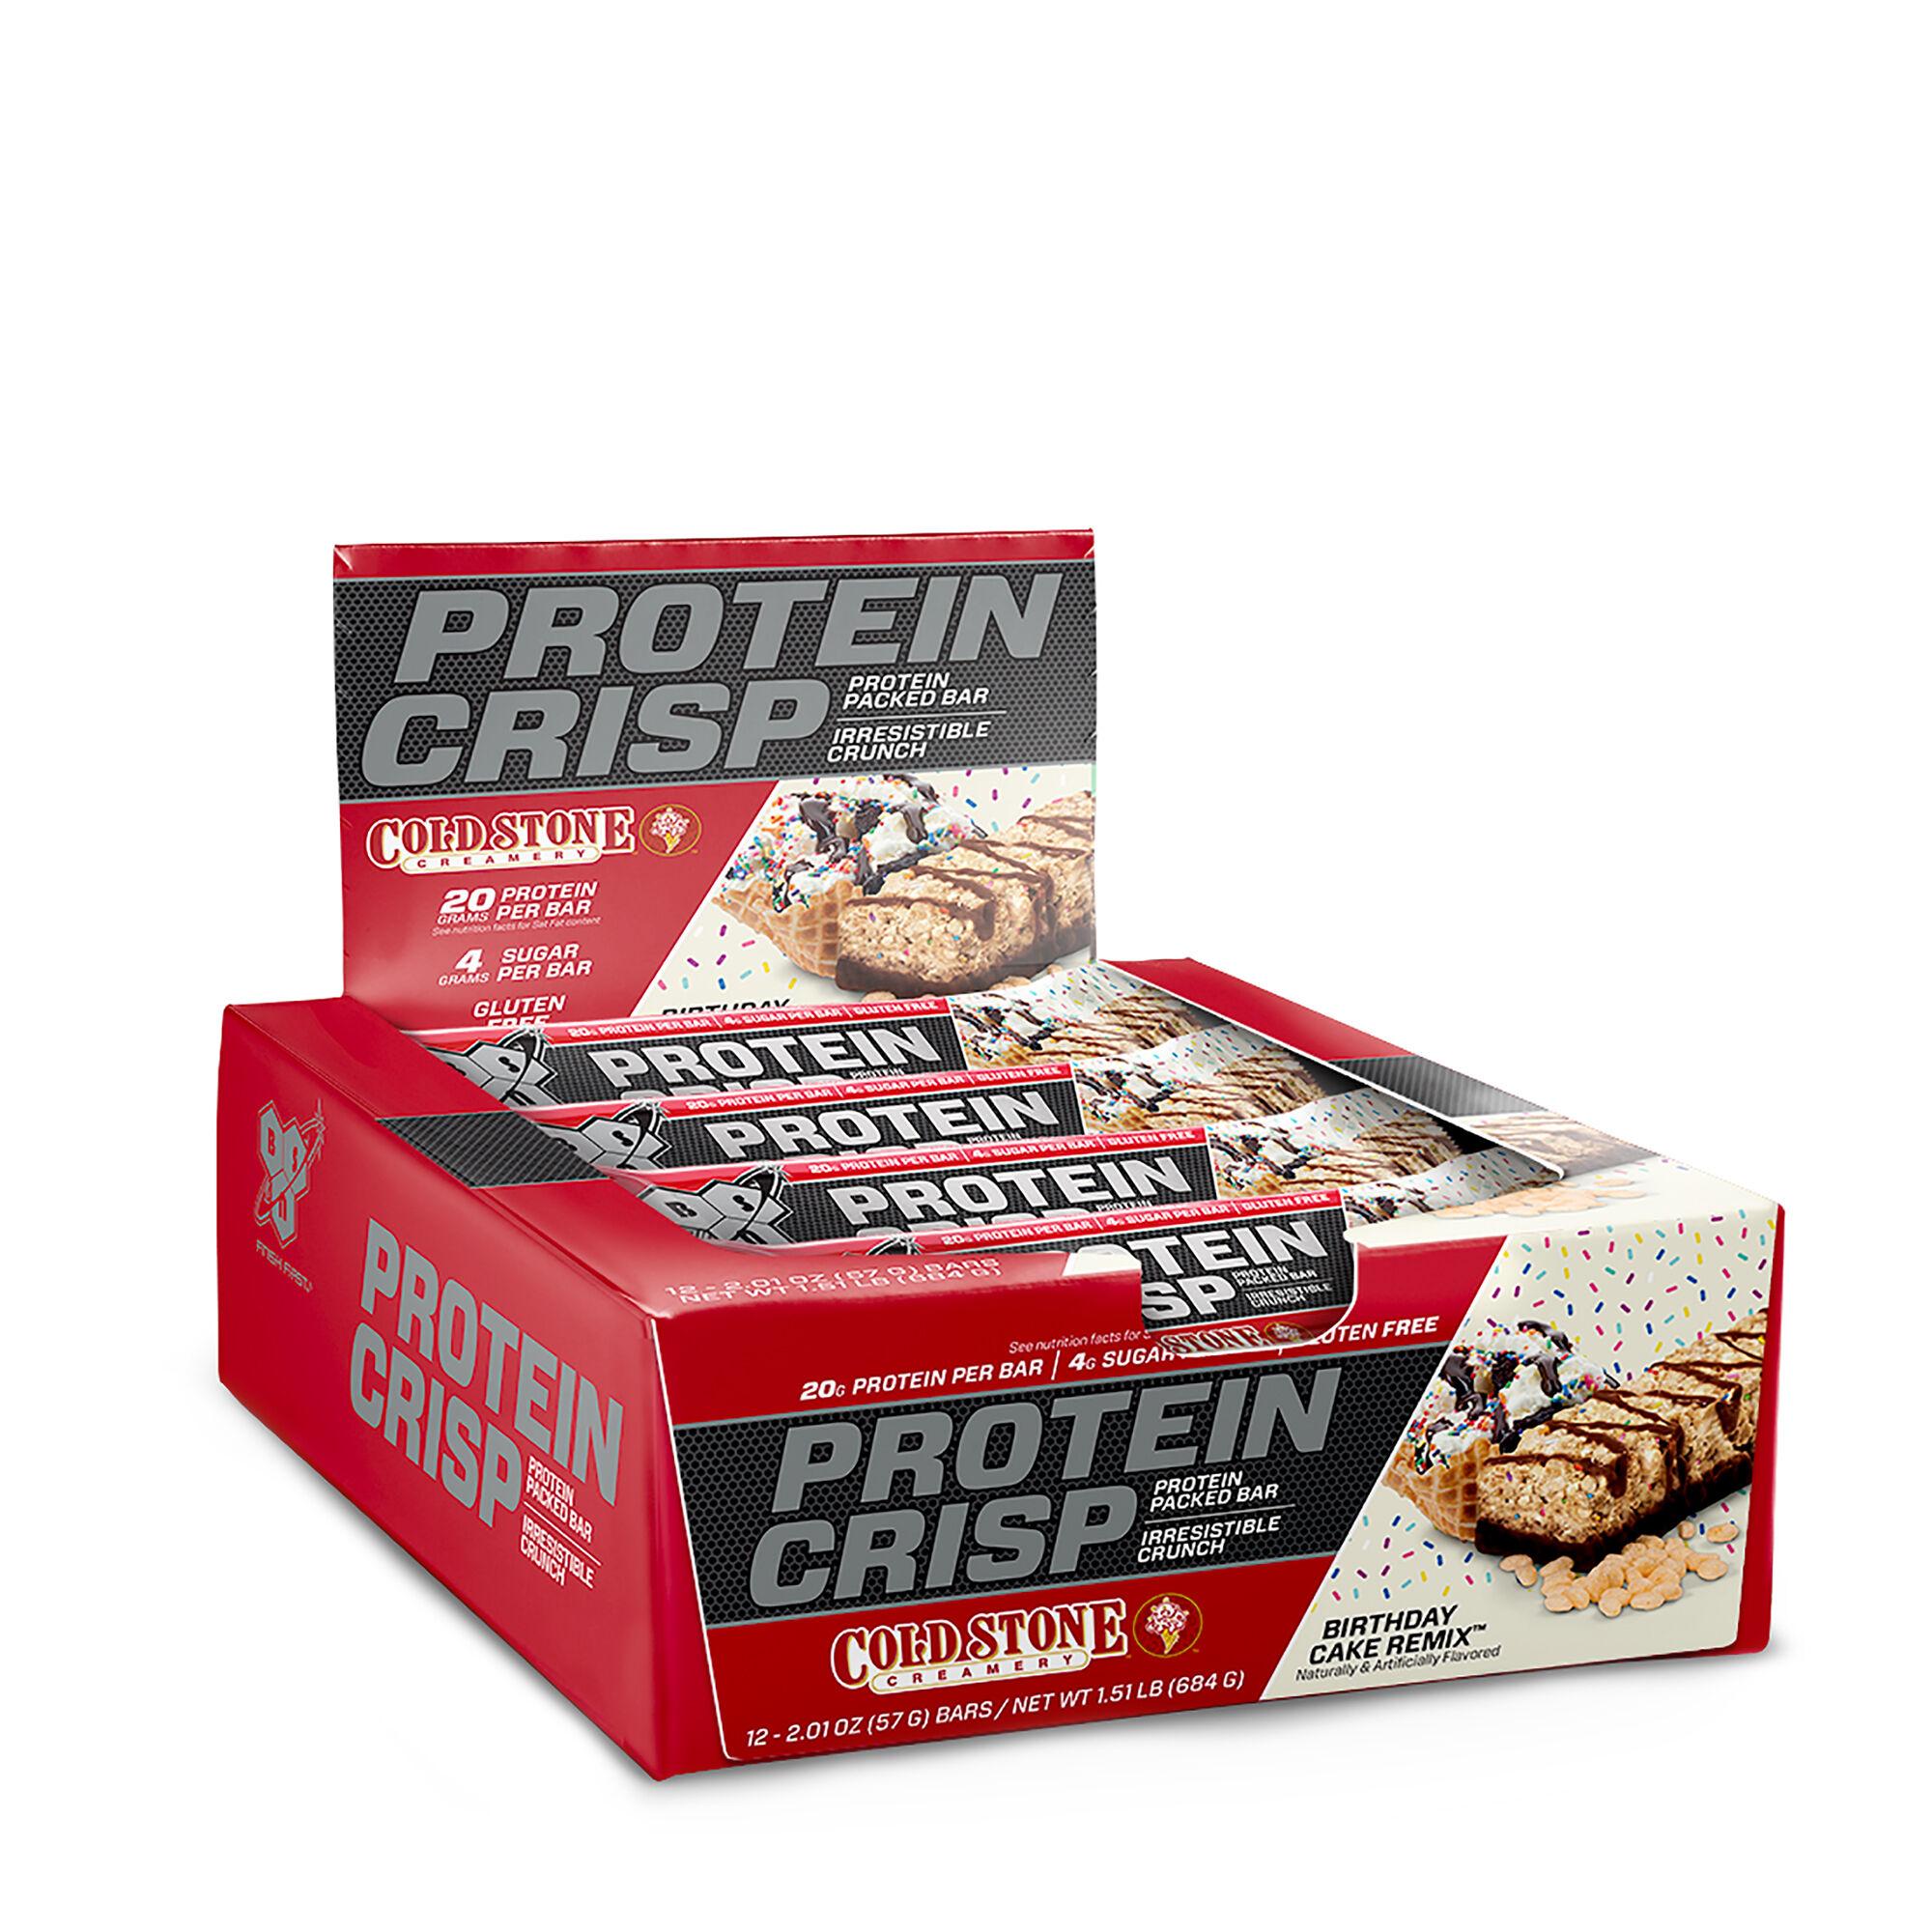 BSNR Protein Crisp Bar Birthday Cake RemixTM 12 Bars